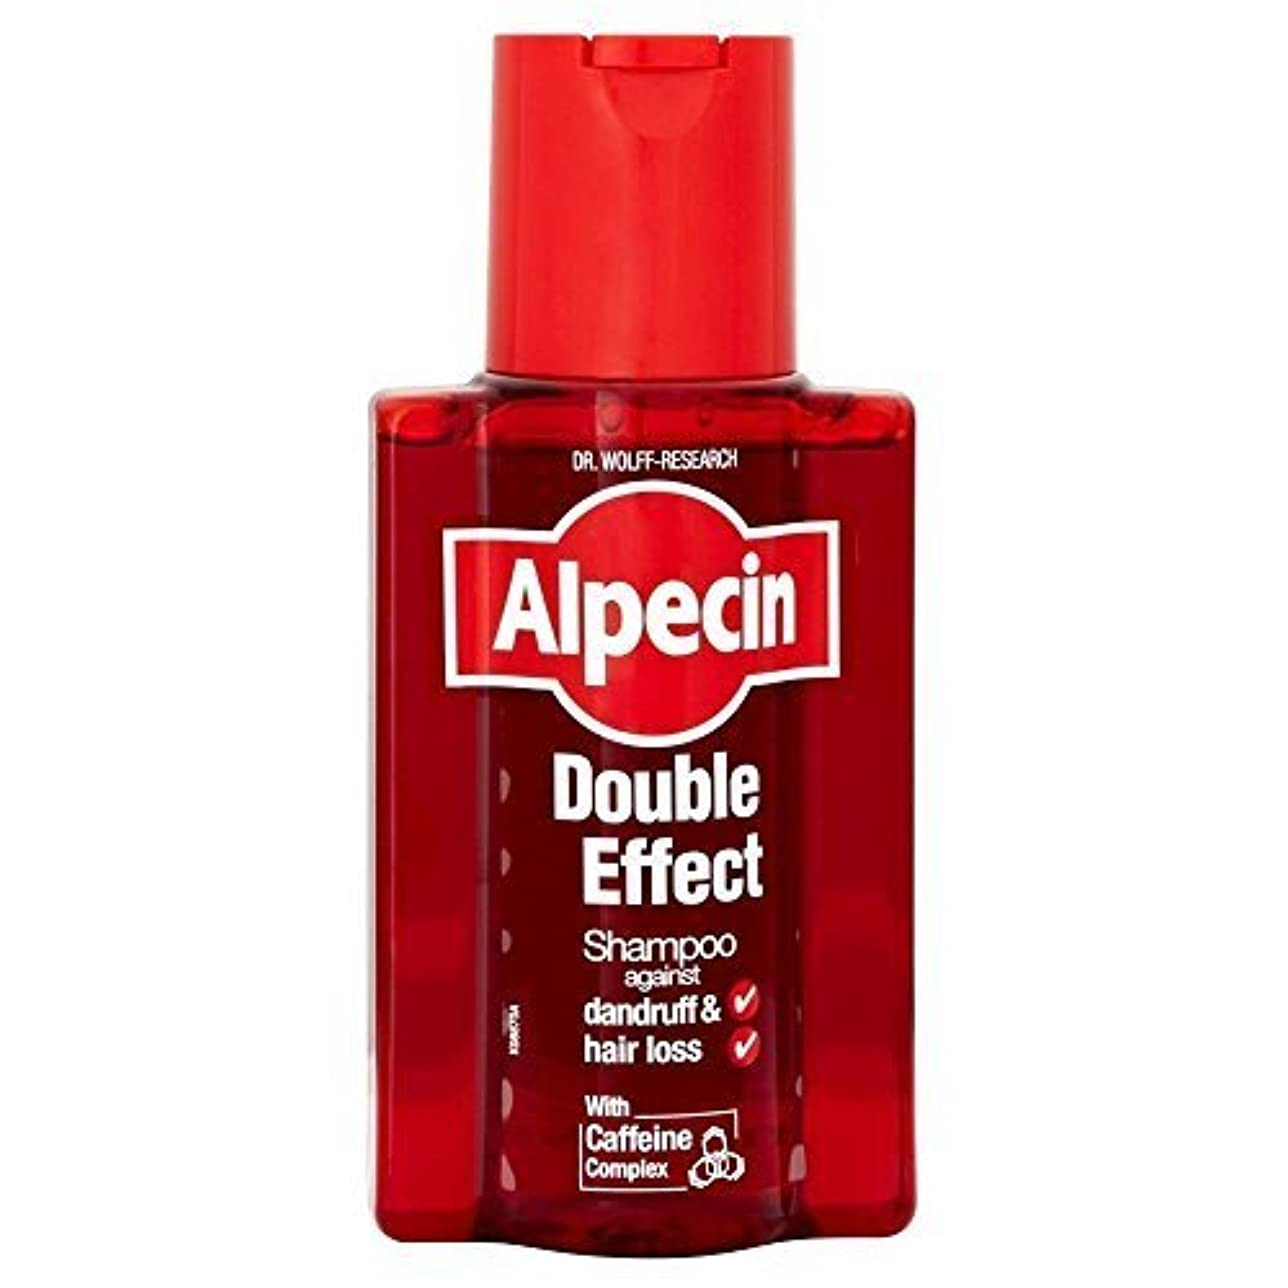 水分望遠鏡対人Alpecin Double Effect Shampoo (200ml) by Grocery [並行輸入品]